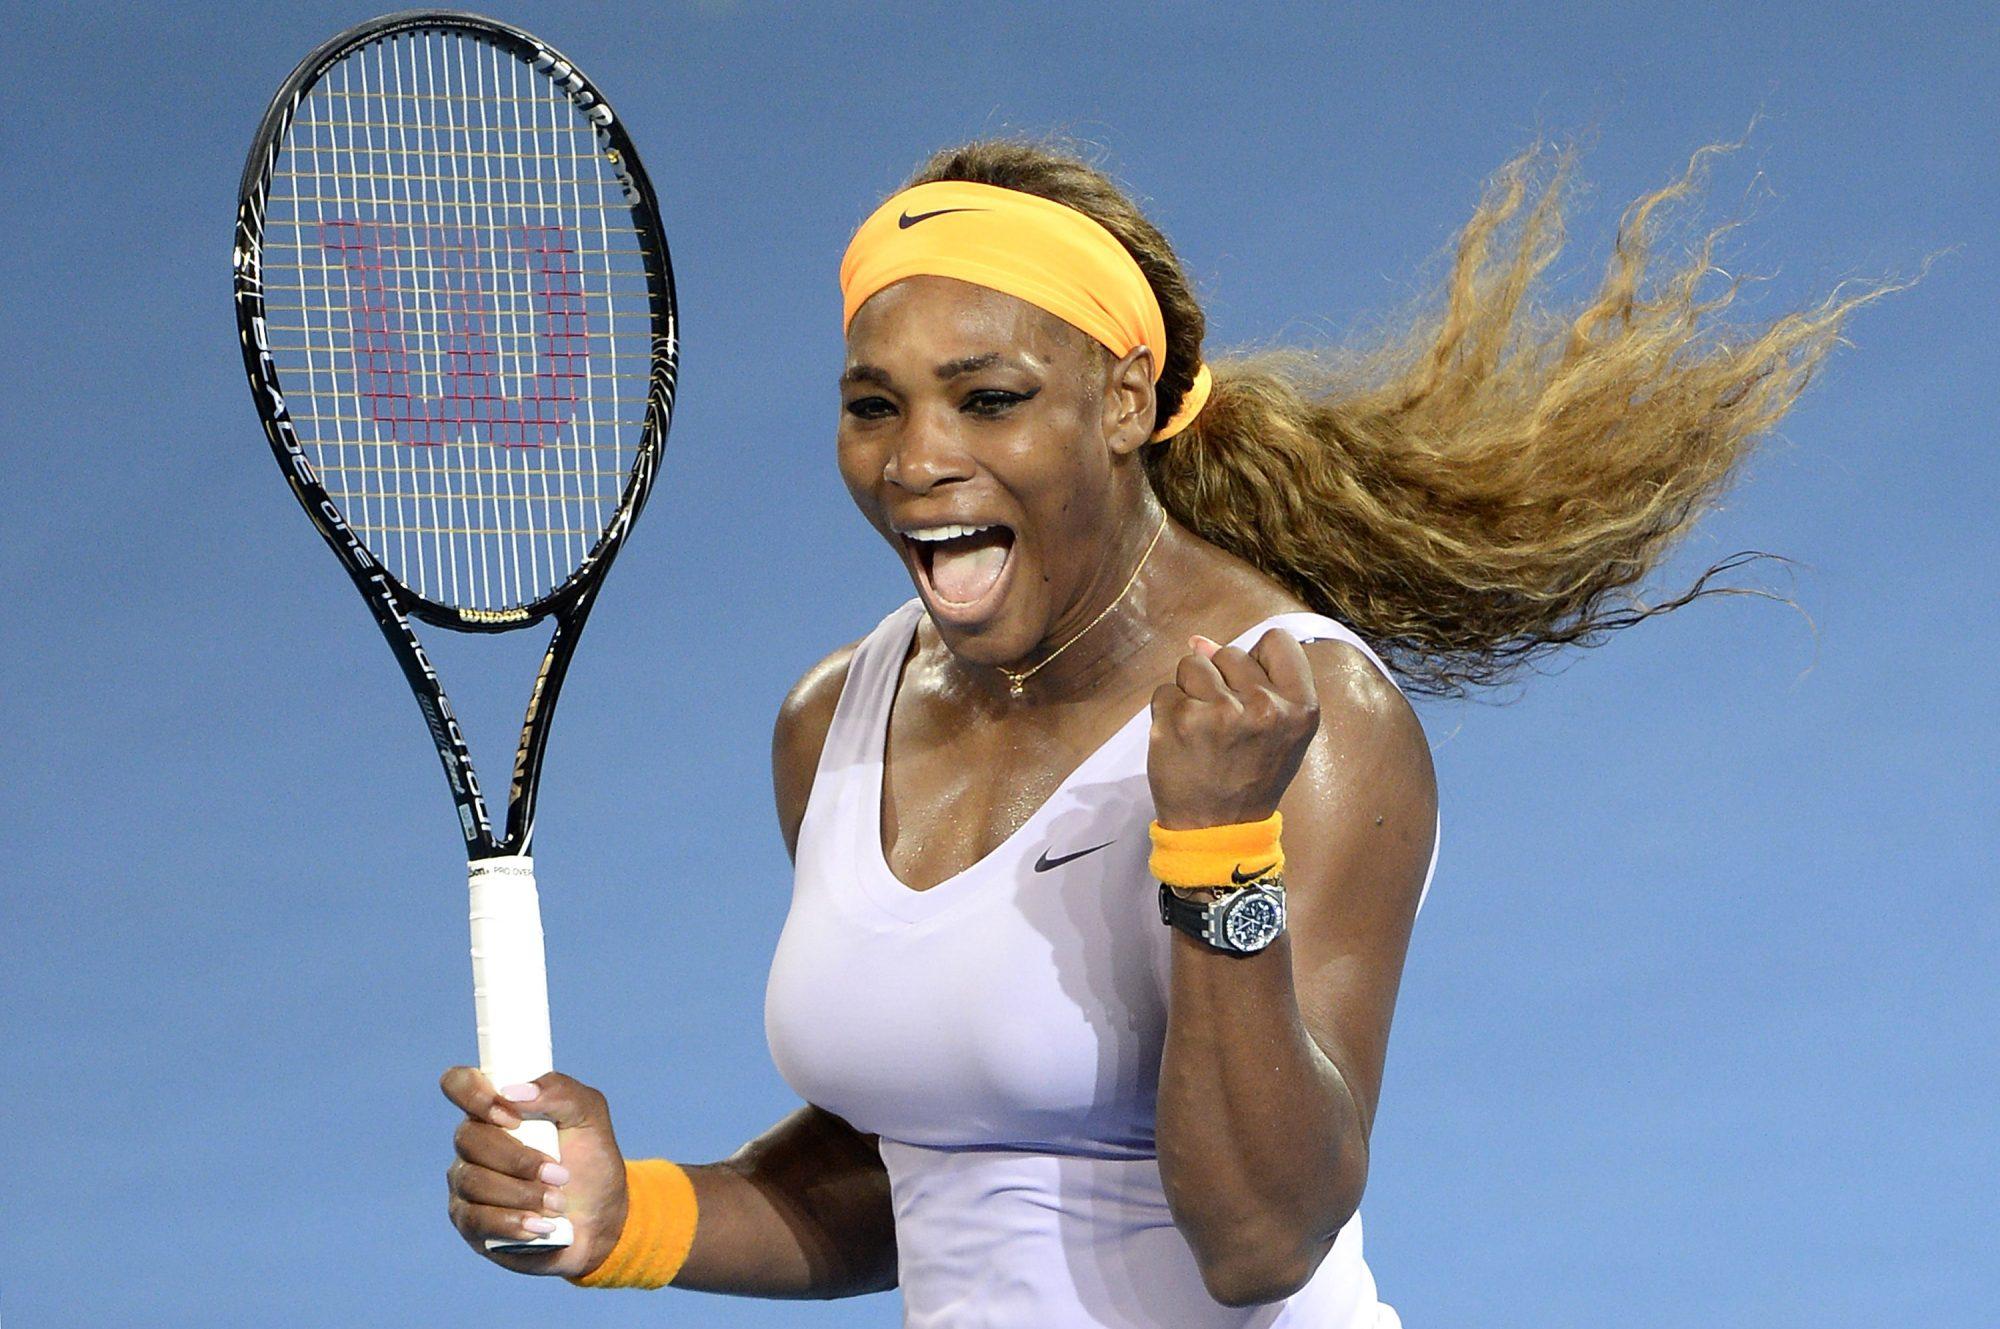 celebrity soulmate astrology; Serena Williams